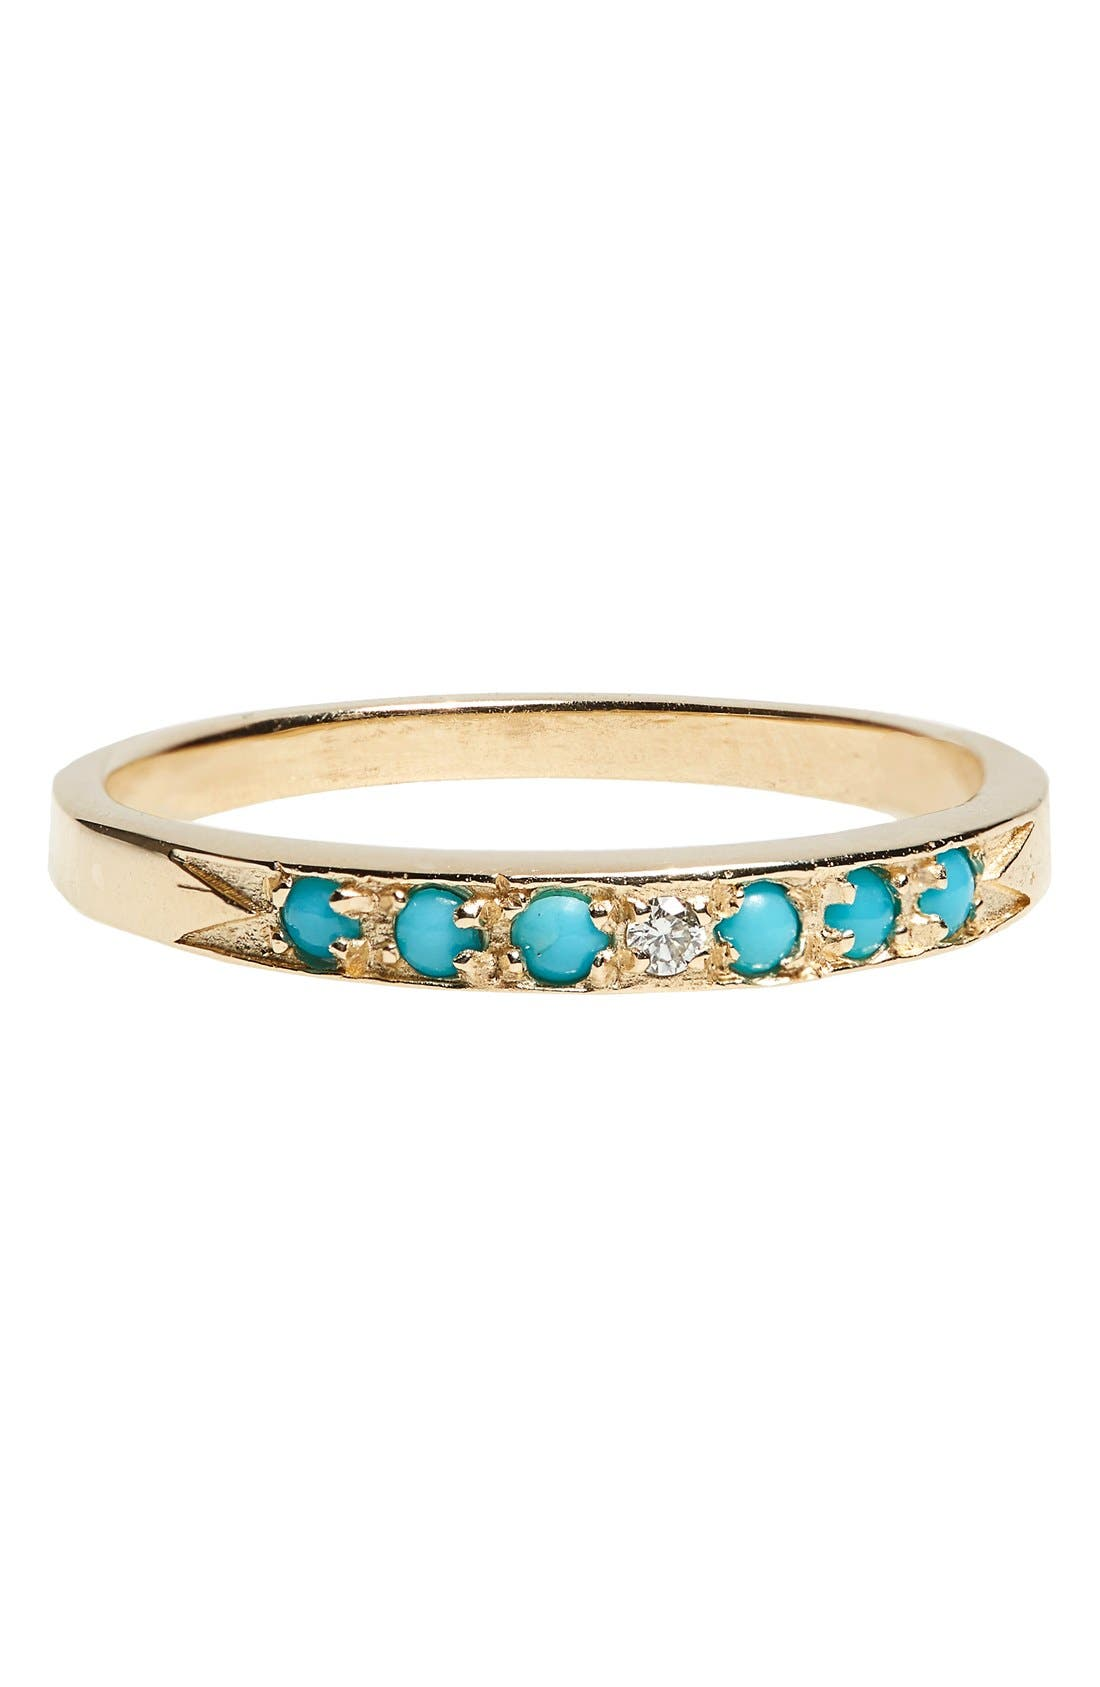 'Moon & Stars' Single Band Turquoise & Diamond Ring,                         Main,                         color,